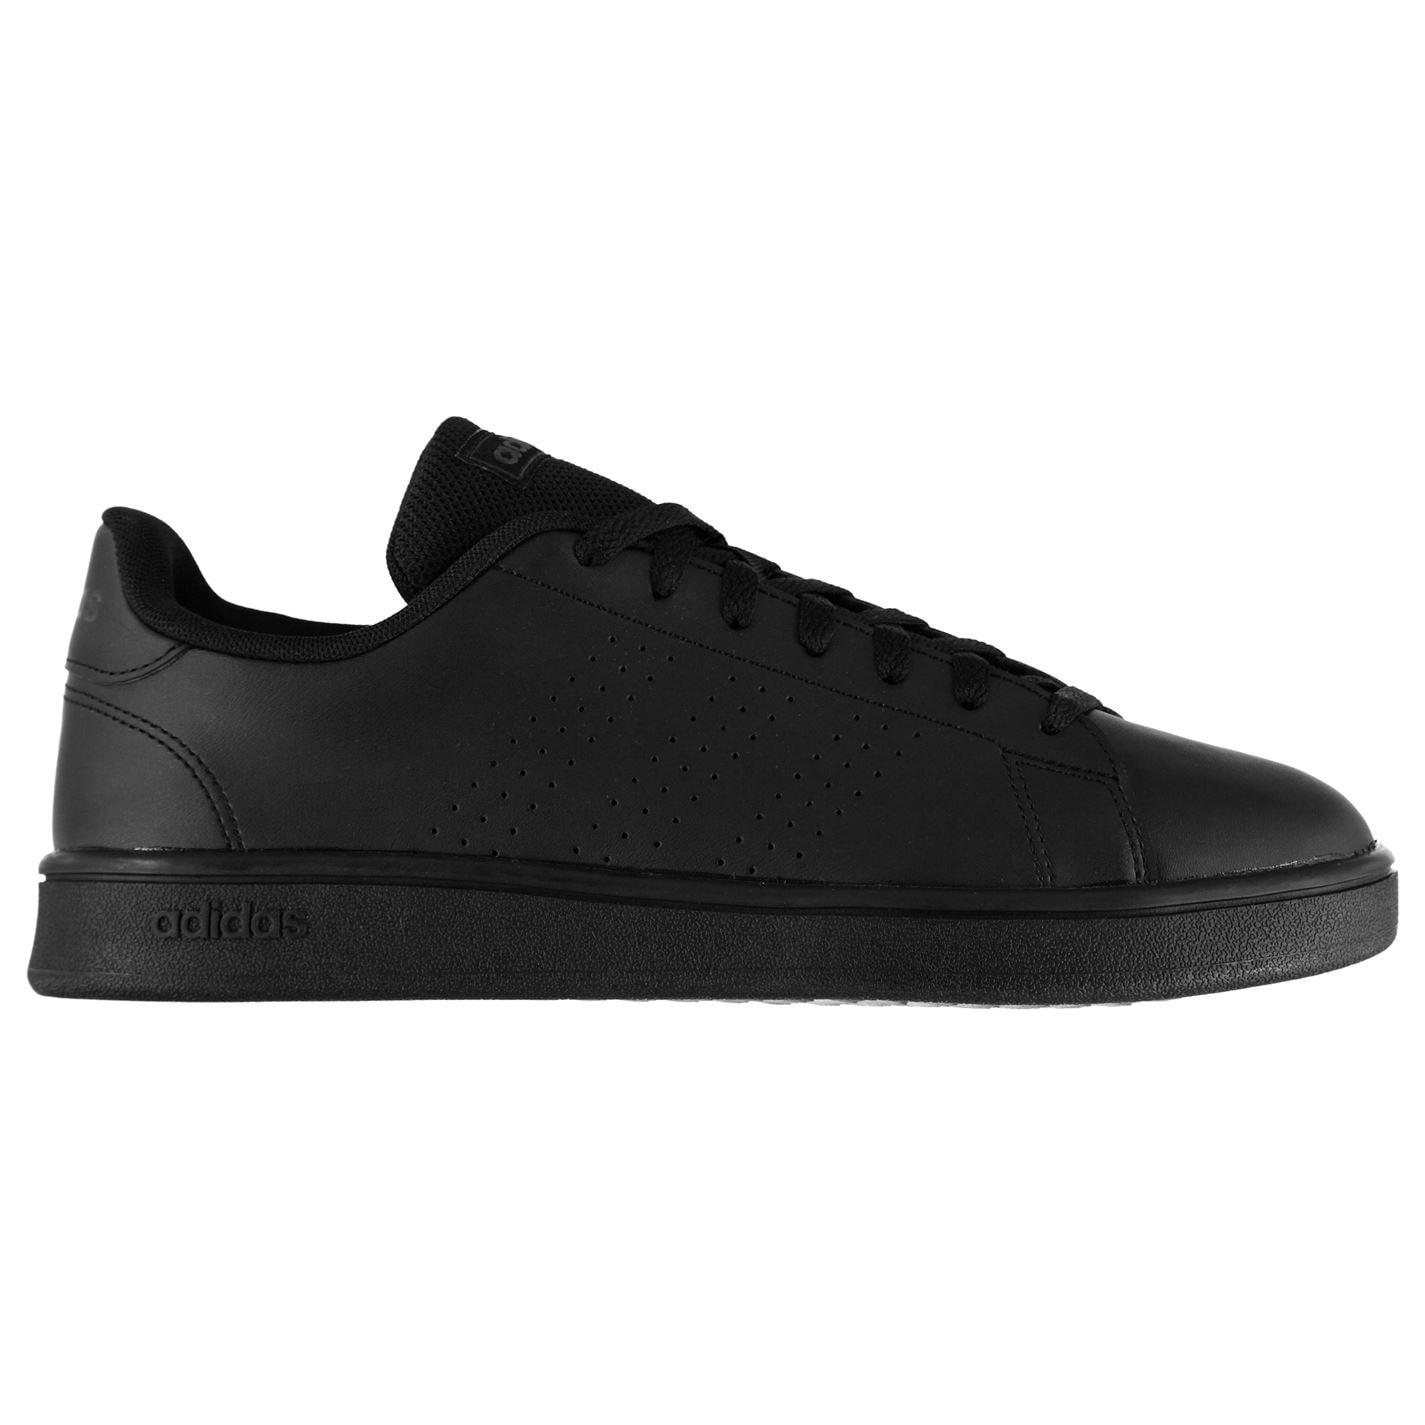 Adidas Advantage Base Mens Trainers Pánská obuv 16300603 9 (43.3)